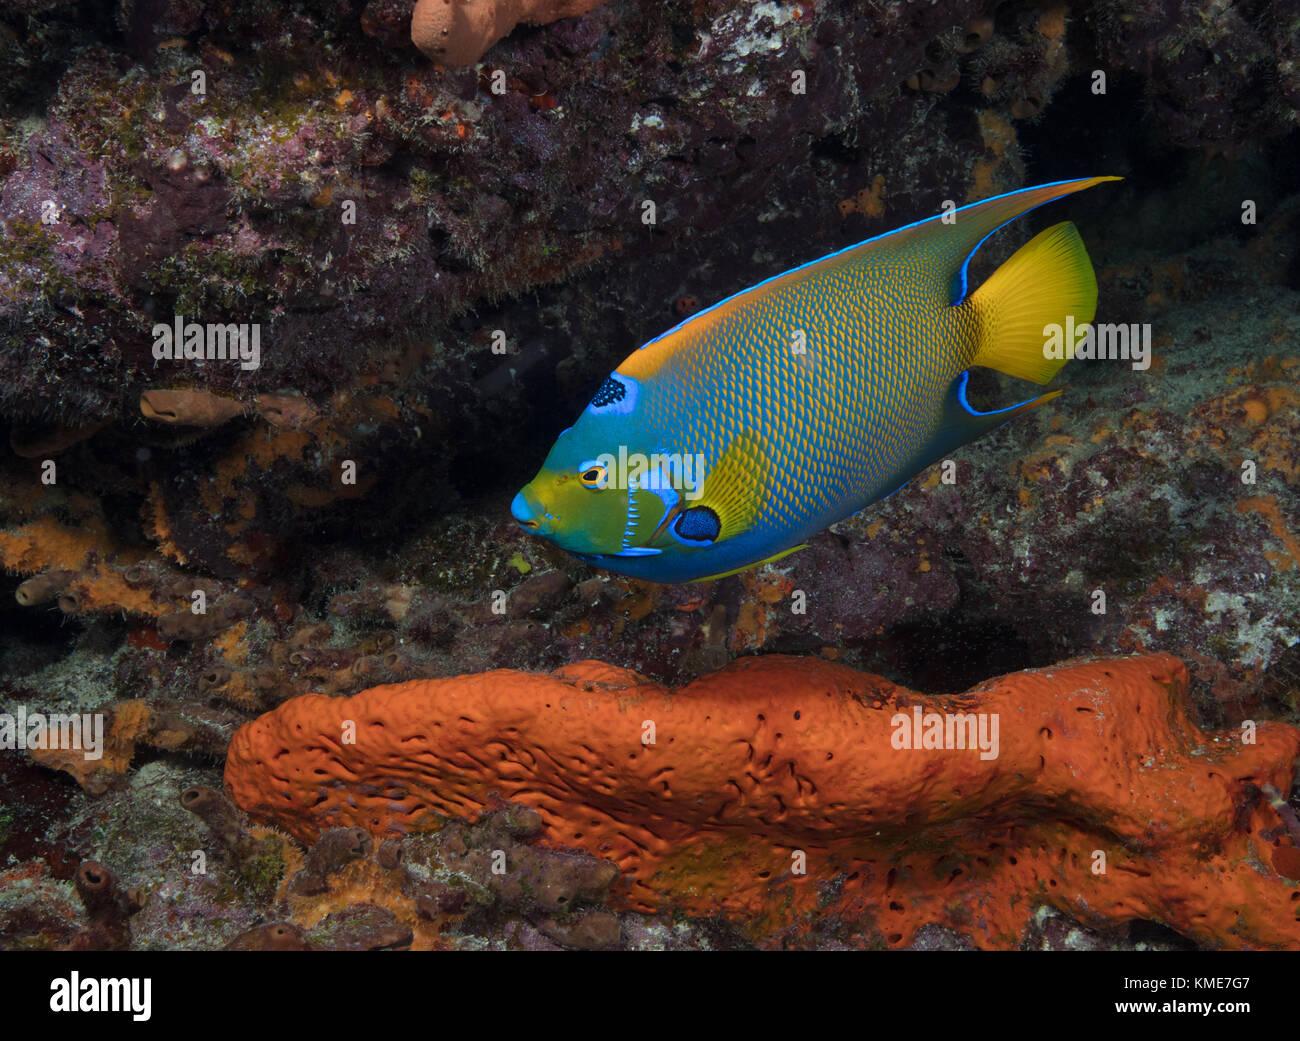 El pez ángel reina (holacanthus ciliaris) Foto de stock